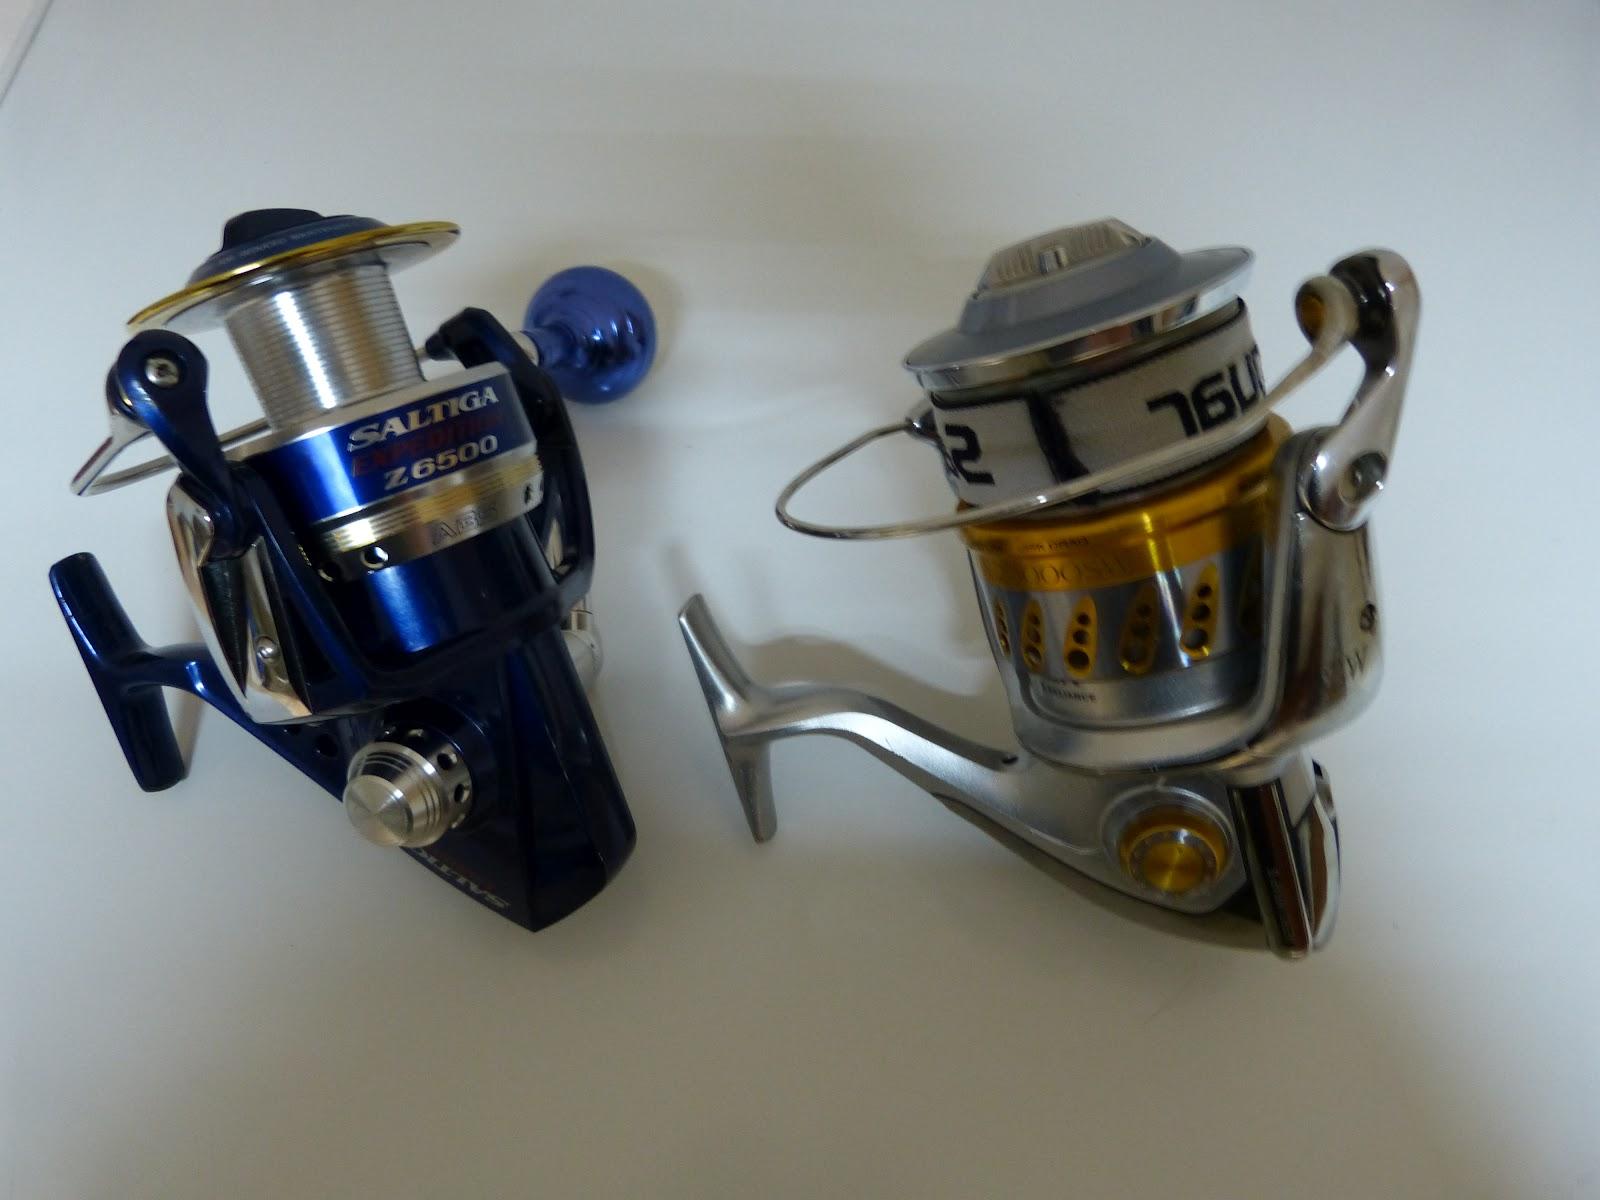 pesca cintina  shimano stella vs daiwa saltiga